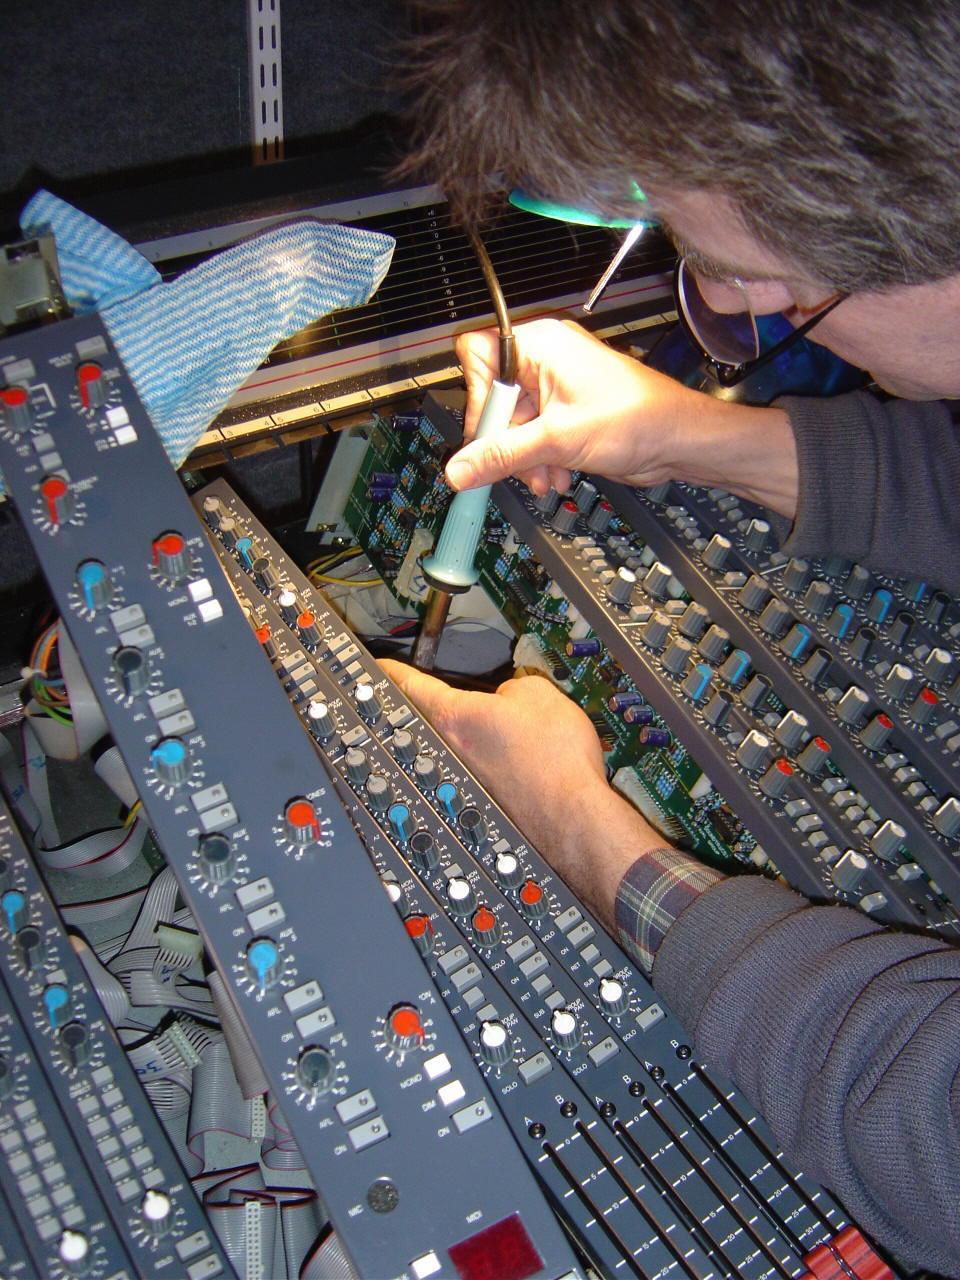 Studio Systems - The home where the Soundtracs roam